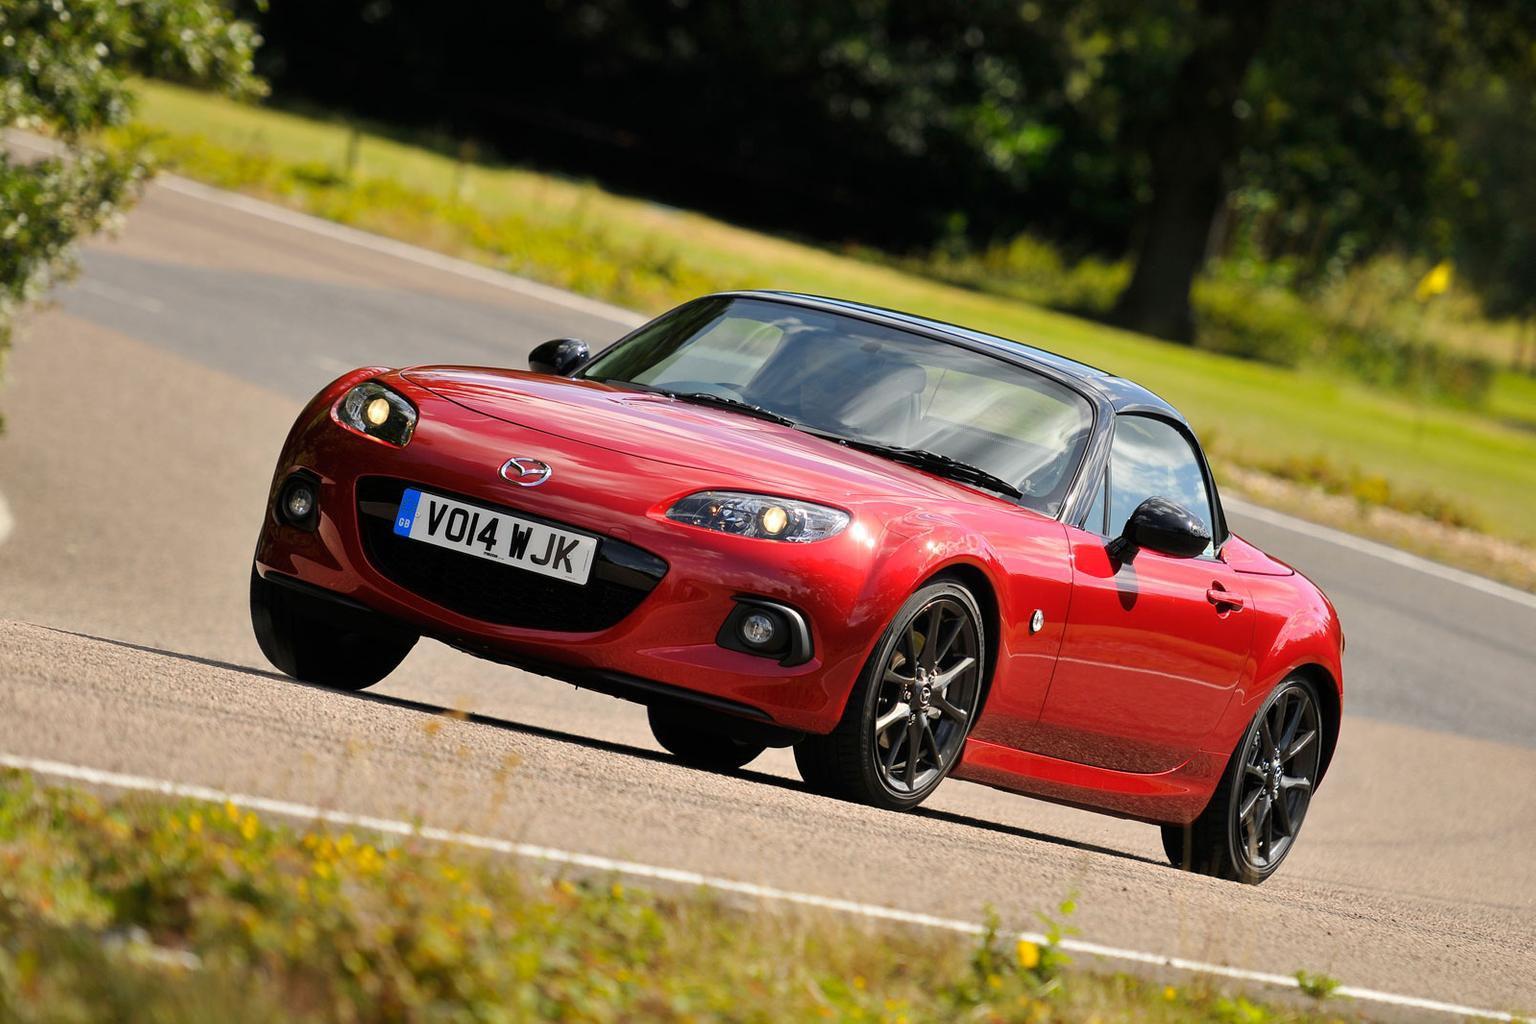 2014 Mazda MX-5 25th Anniversary Edition review